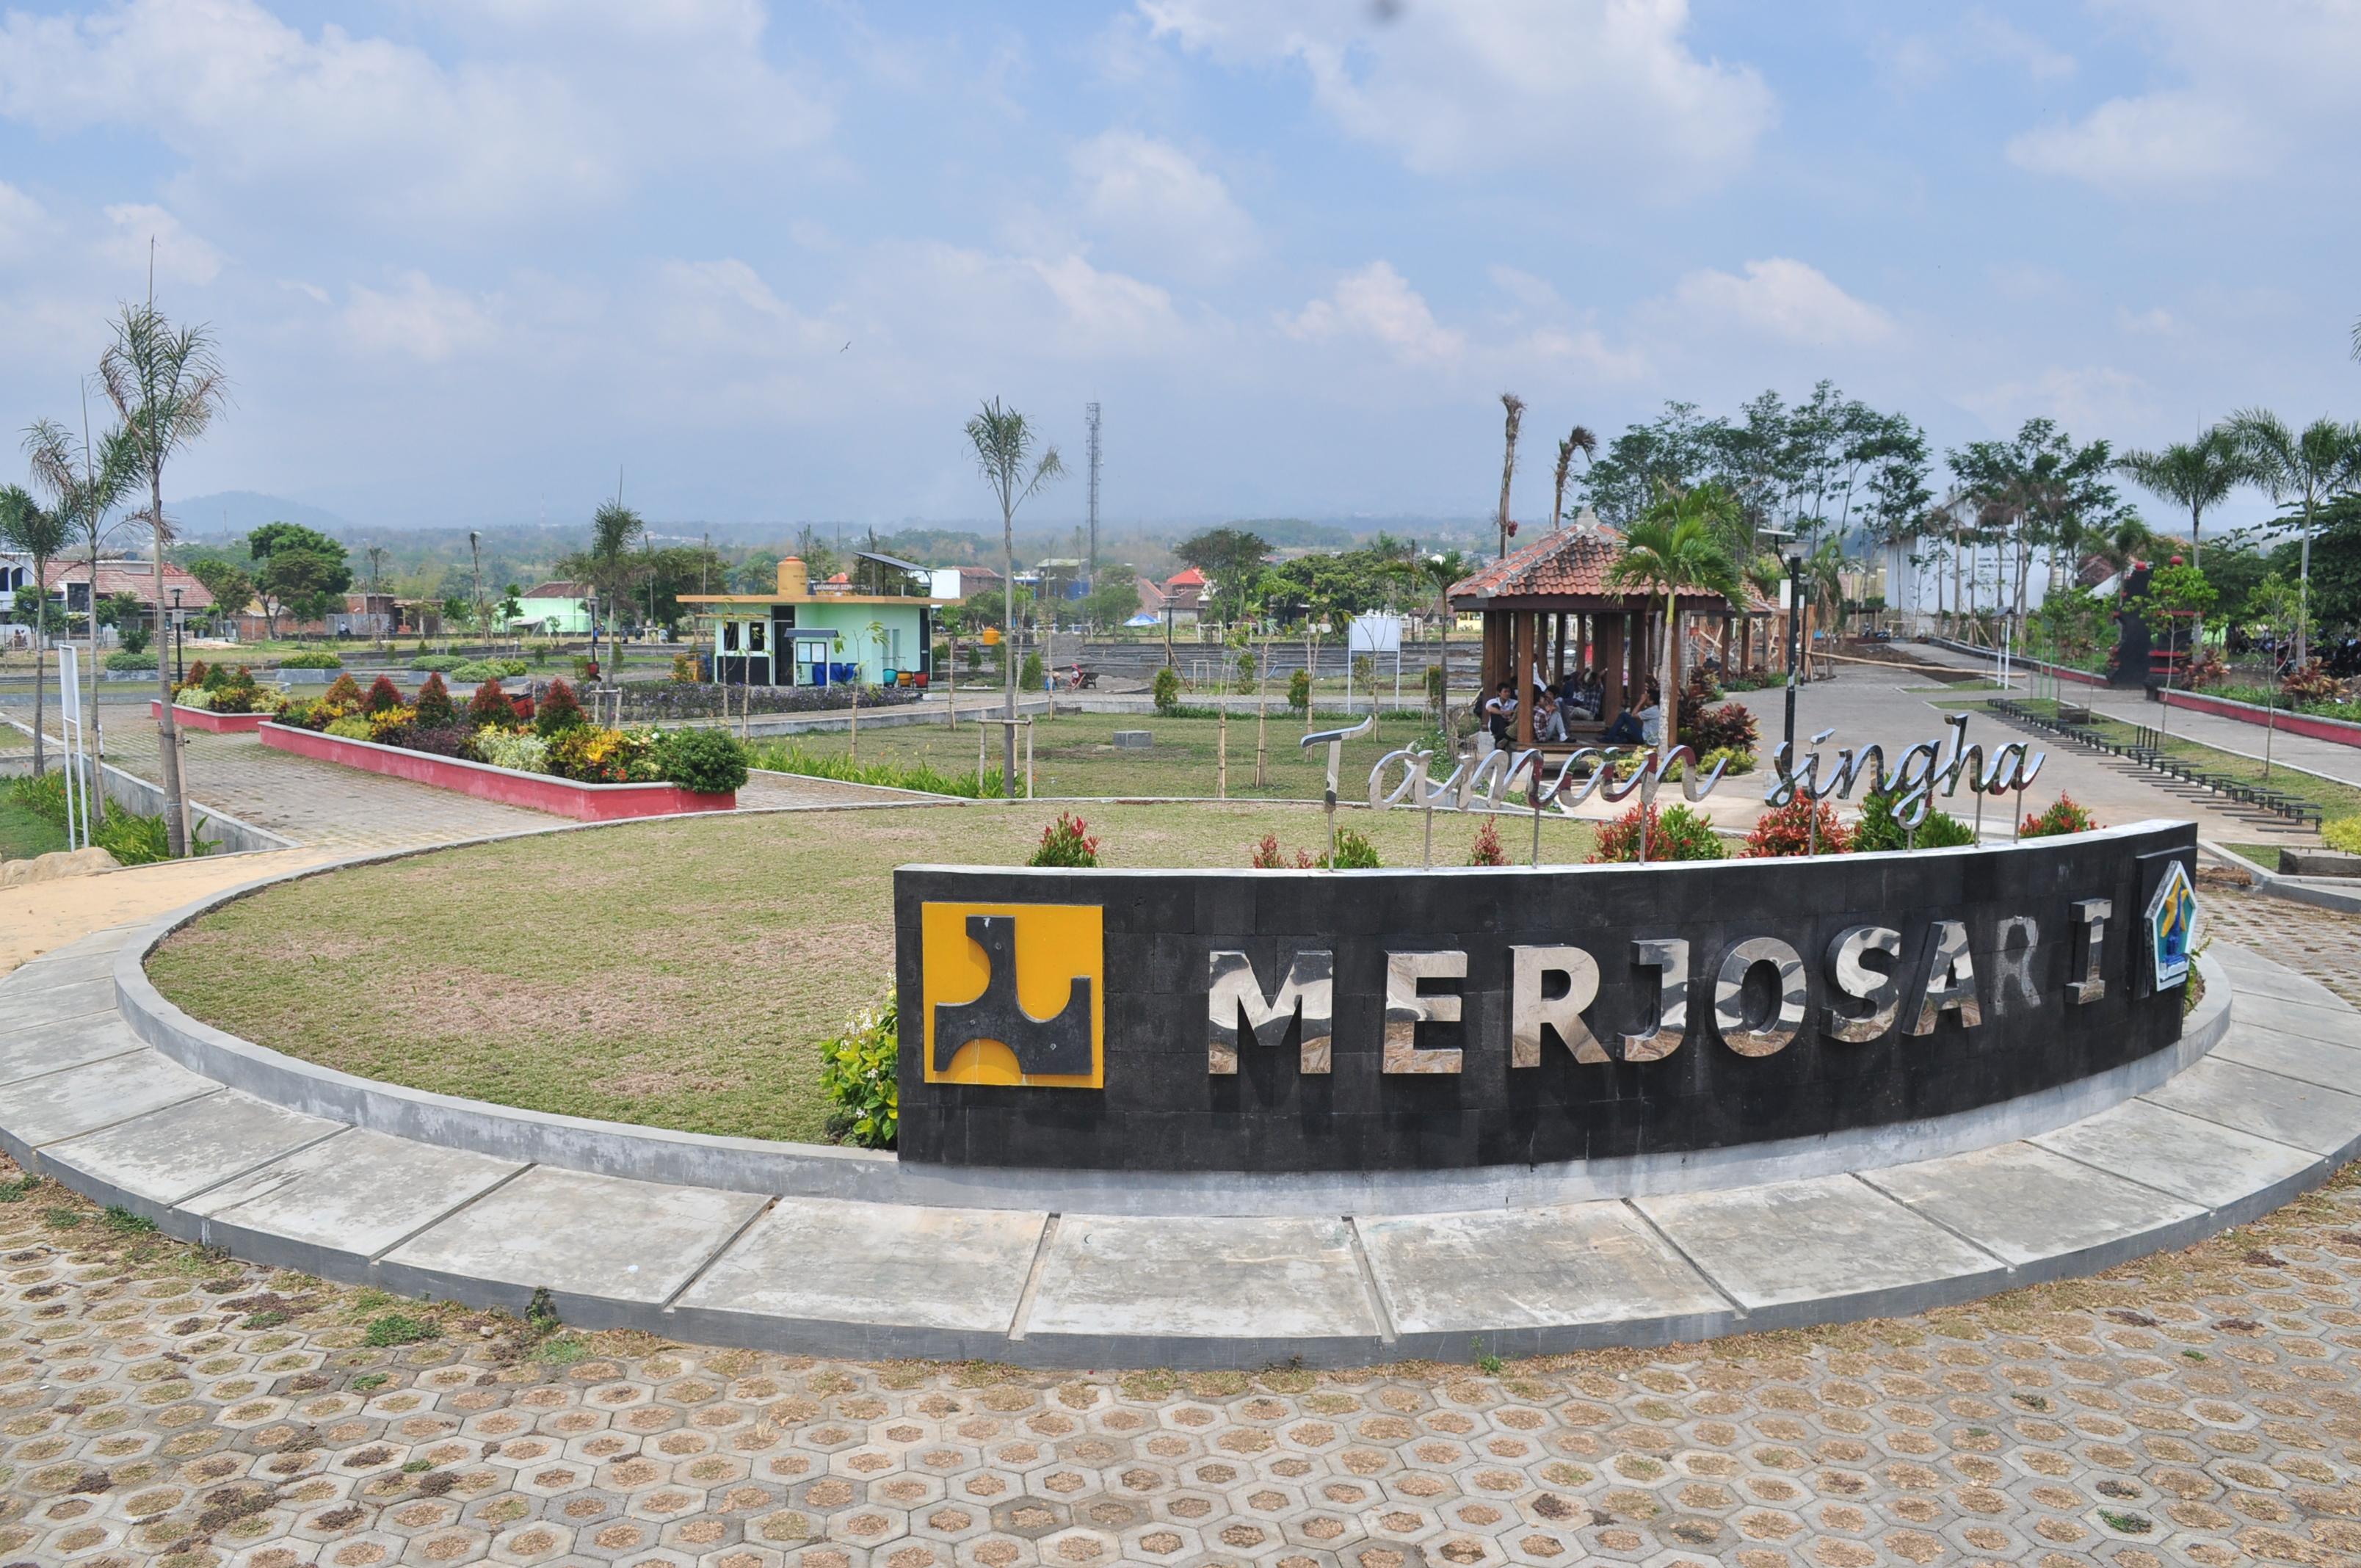 8 Taman Kota Romantis Malang Traveling Yuk Singha Merjosari Image